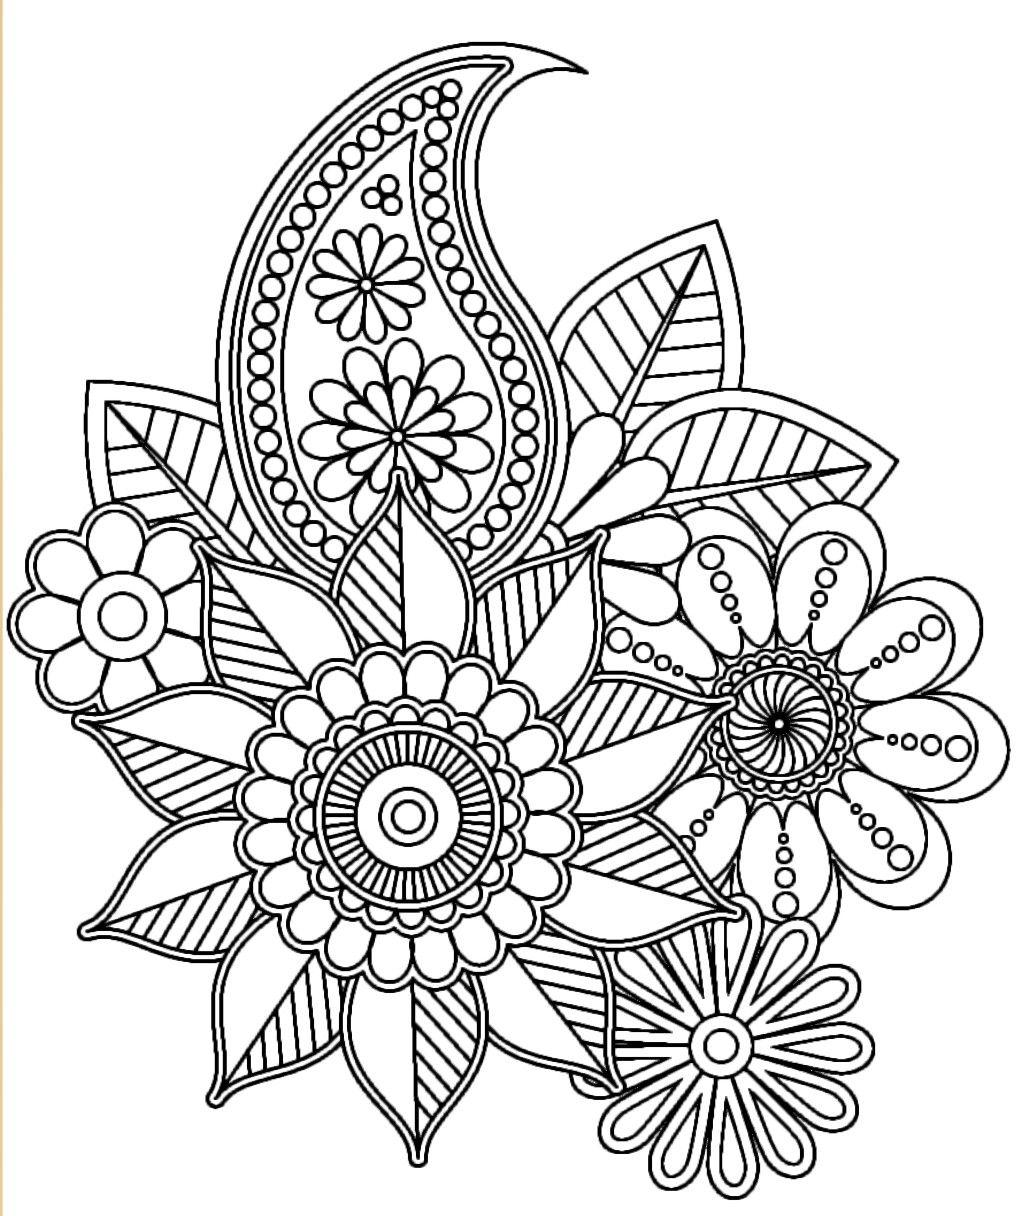 0065e712504a515d34f7443ca55b35ca » Mandala Flower Coloring Page